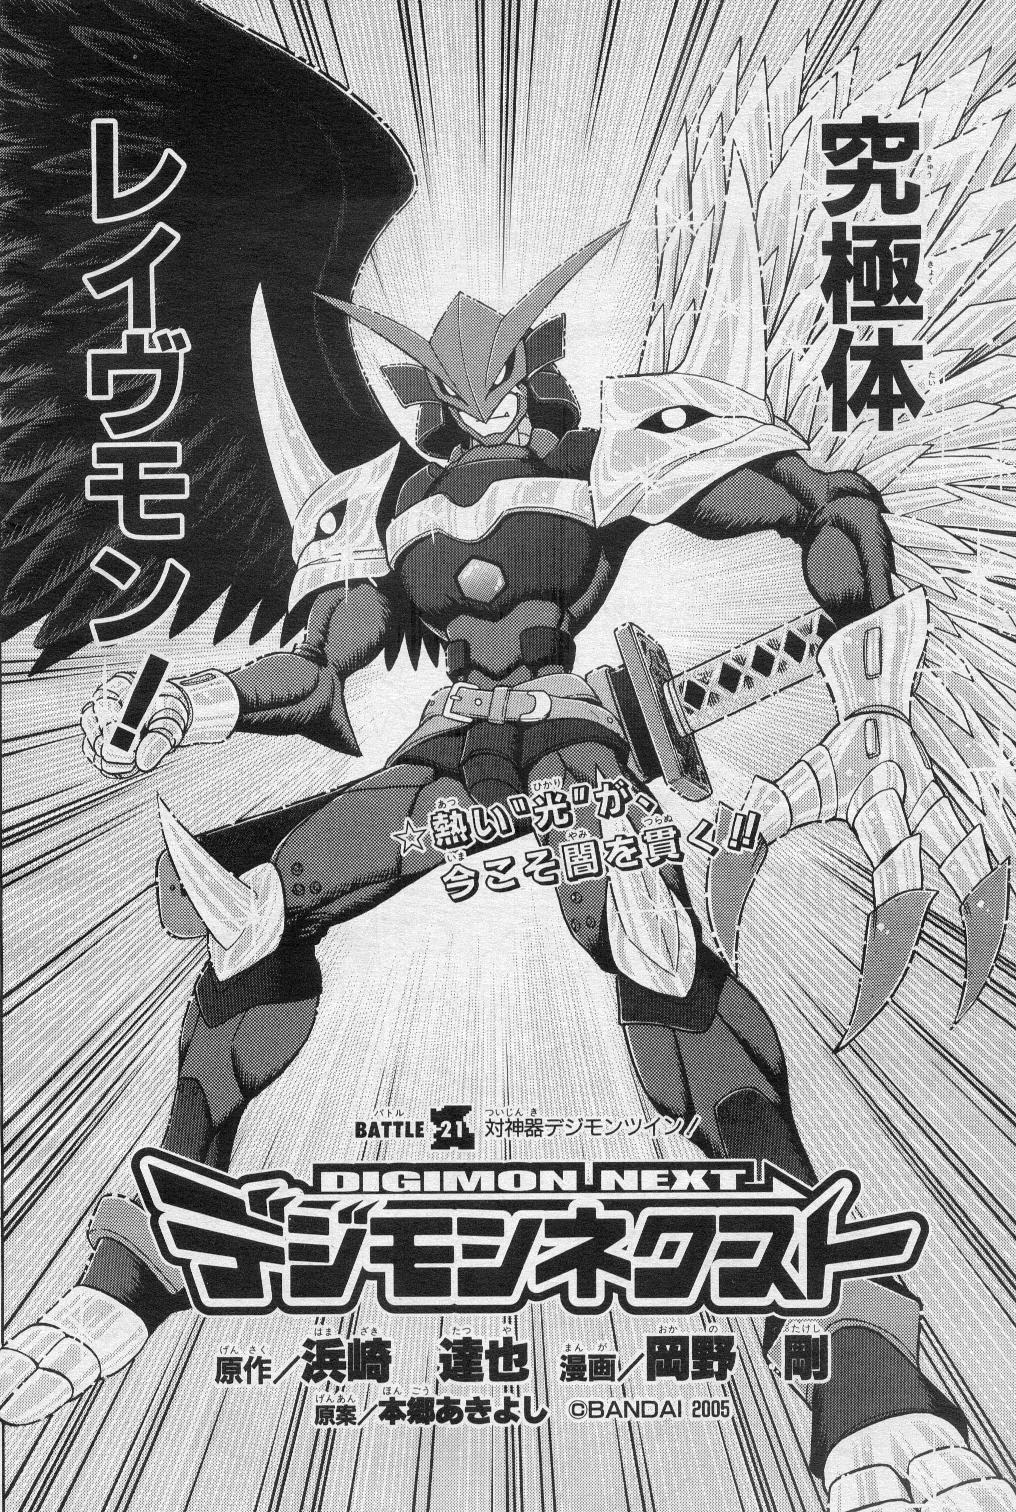 Anti-God Devices Digimon Twin!